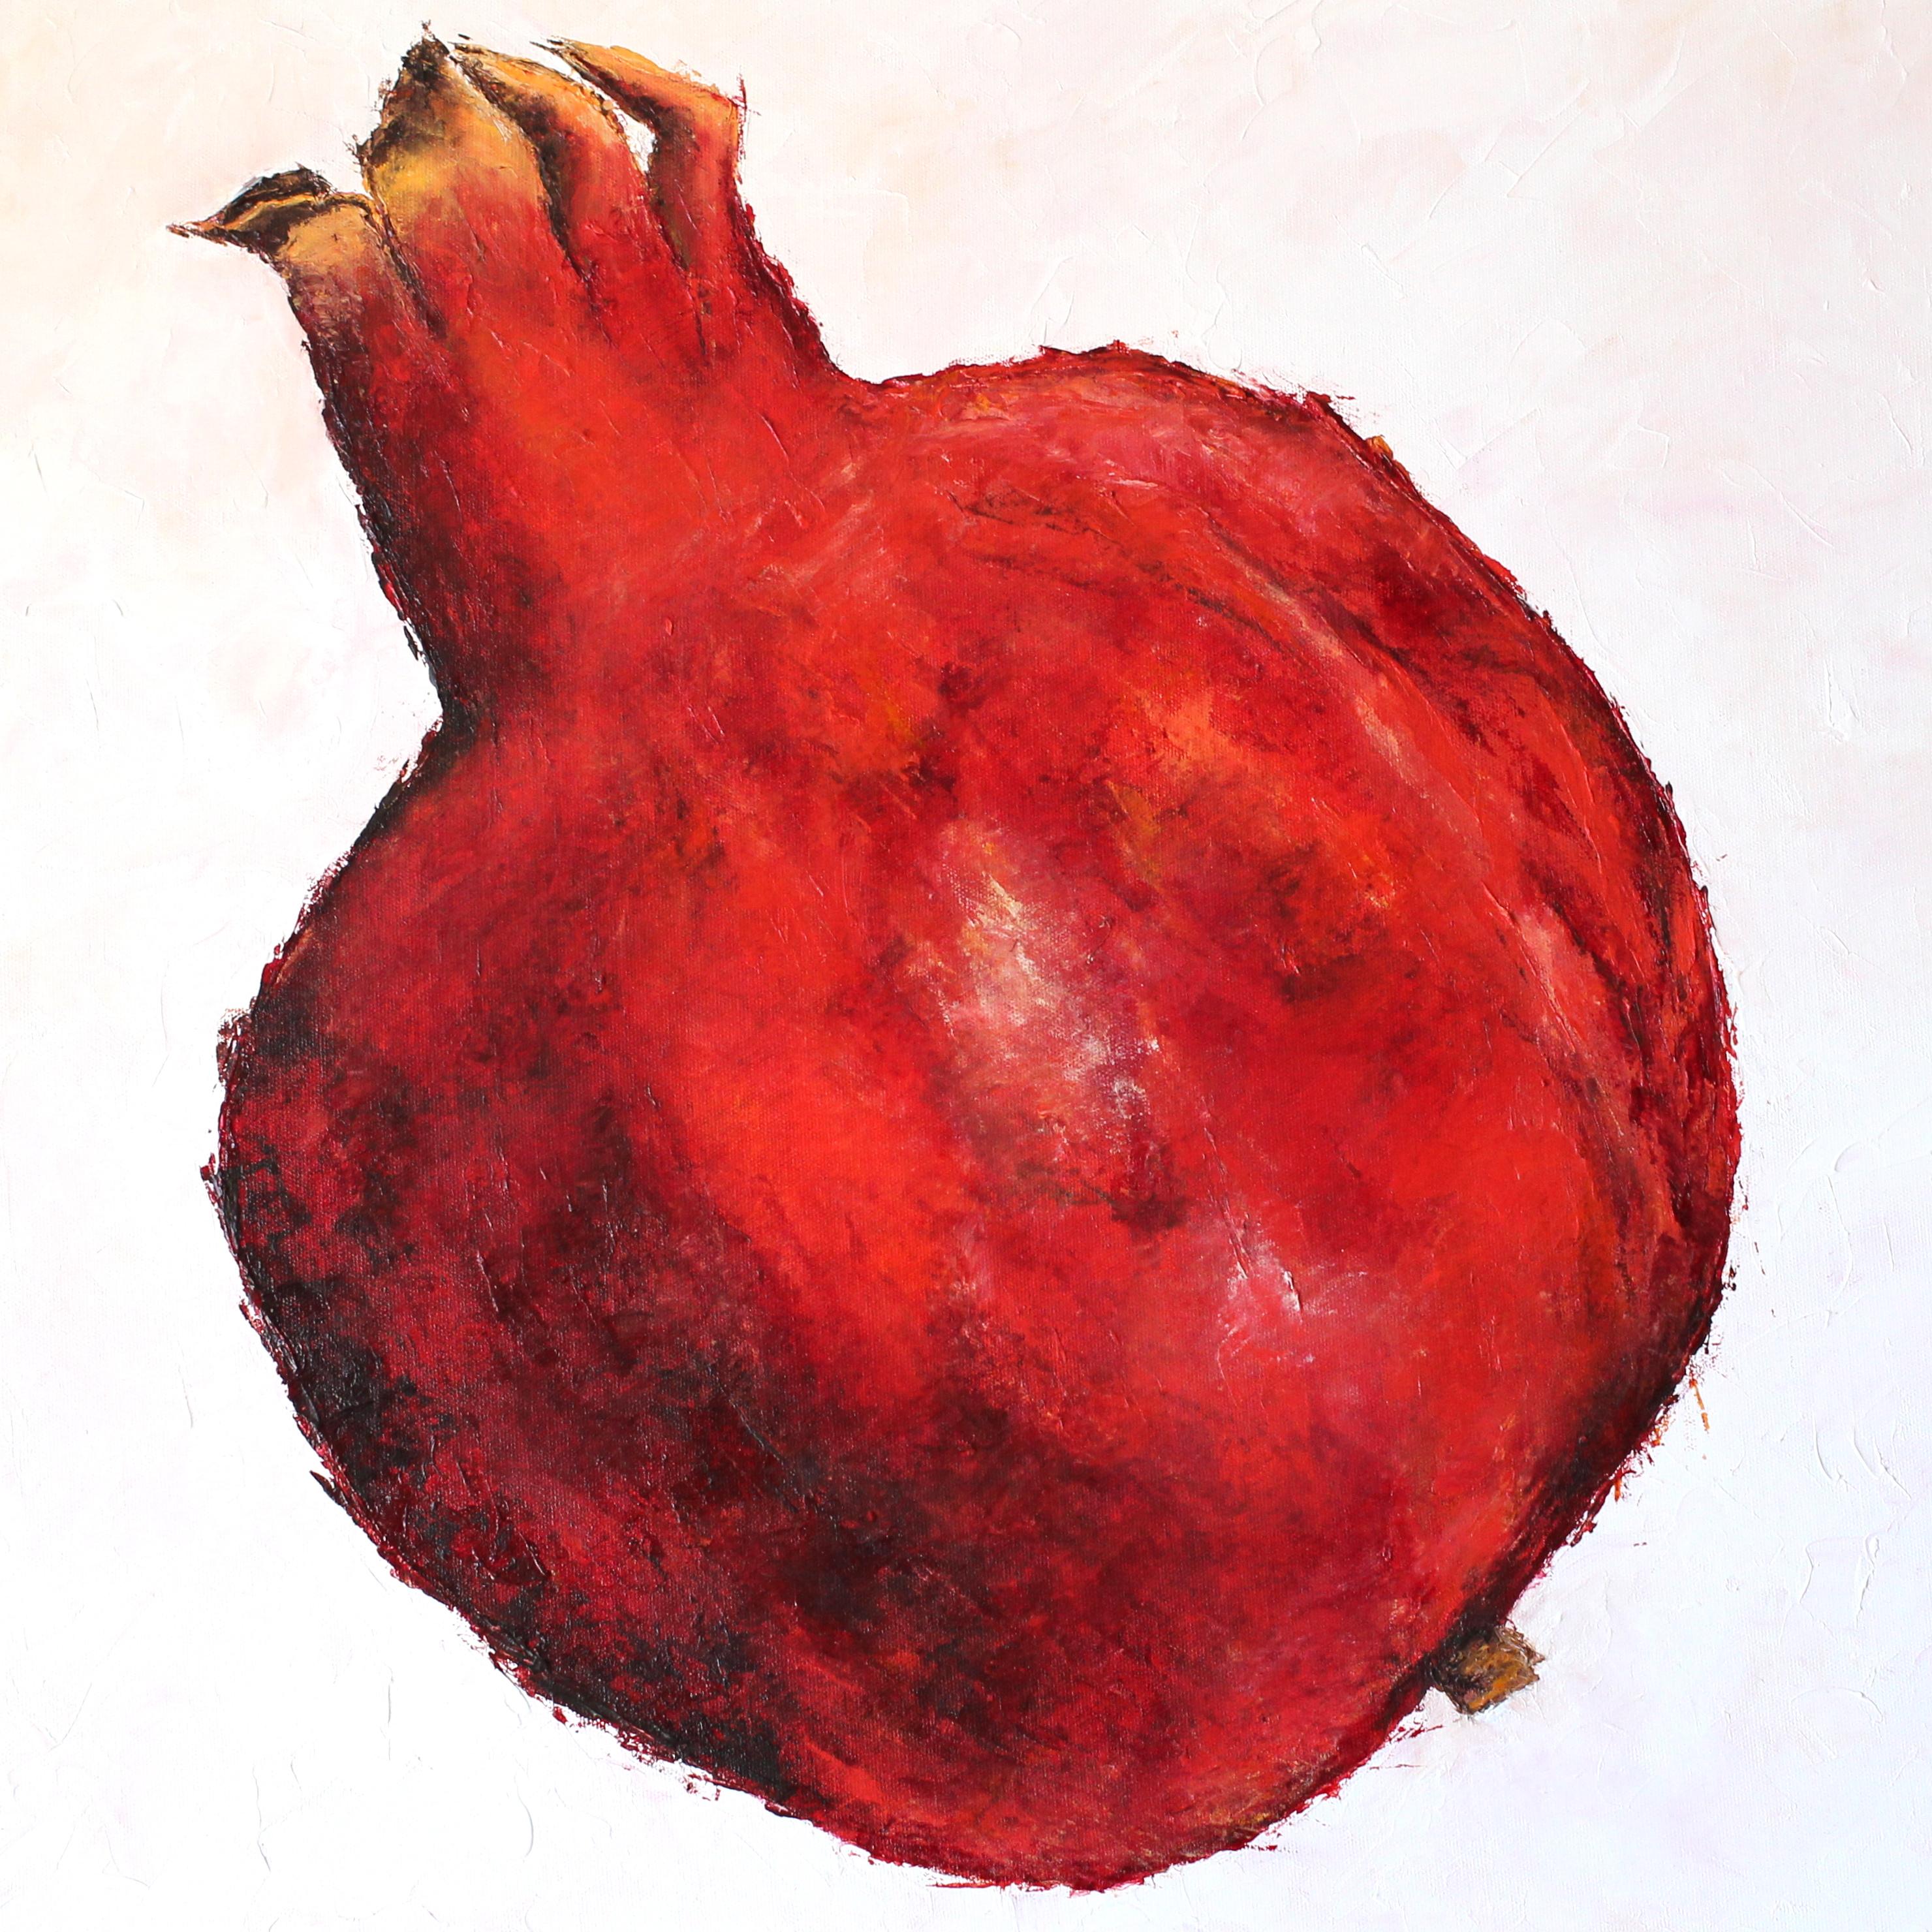 Whole Pomegranate 3